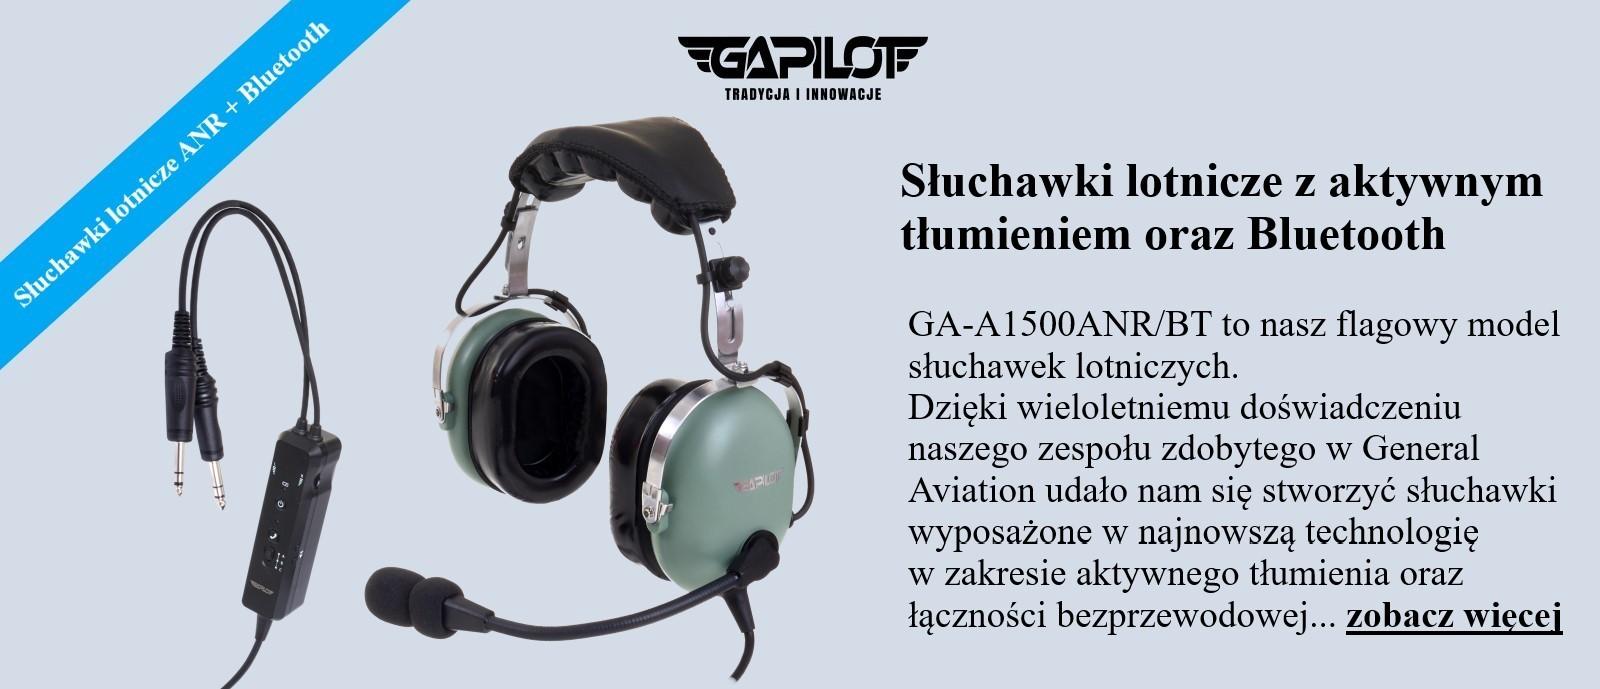 SLUCHAWKI LOTNICZE GA-A1500 ZIELONE ANR BT